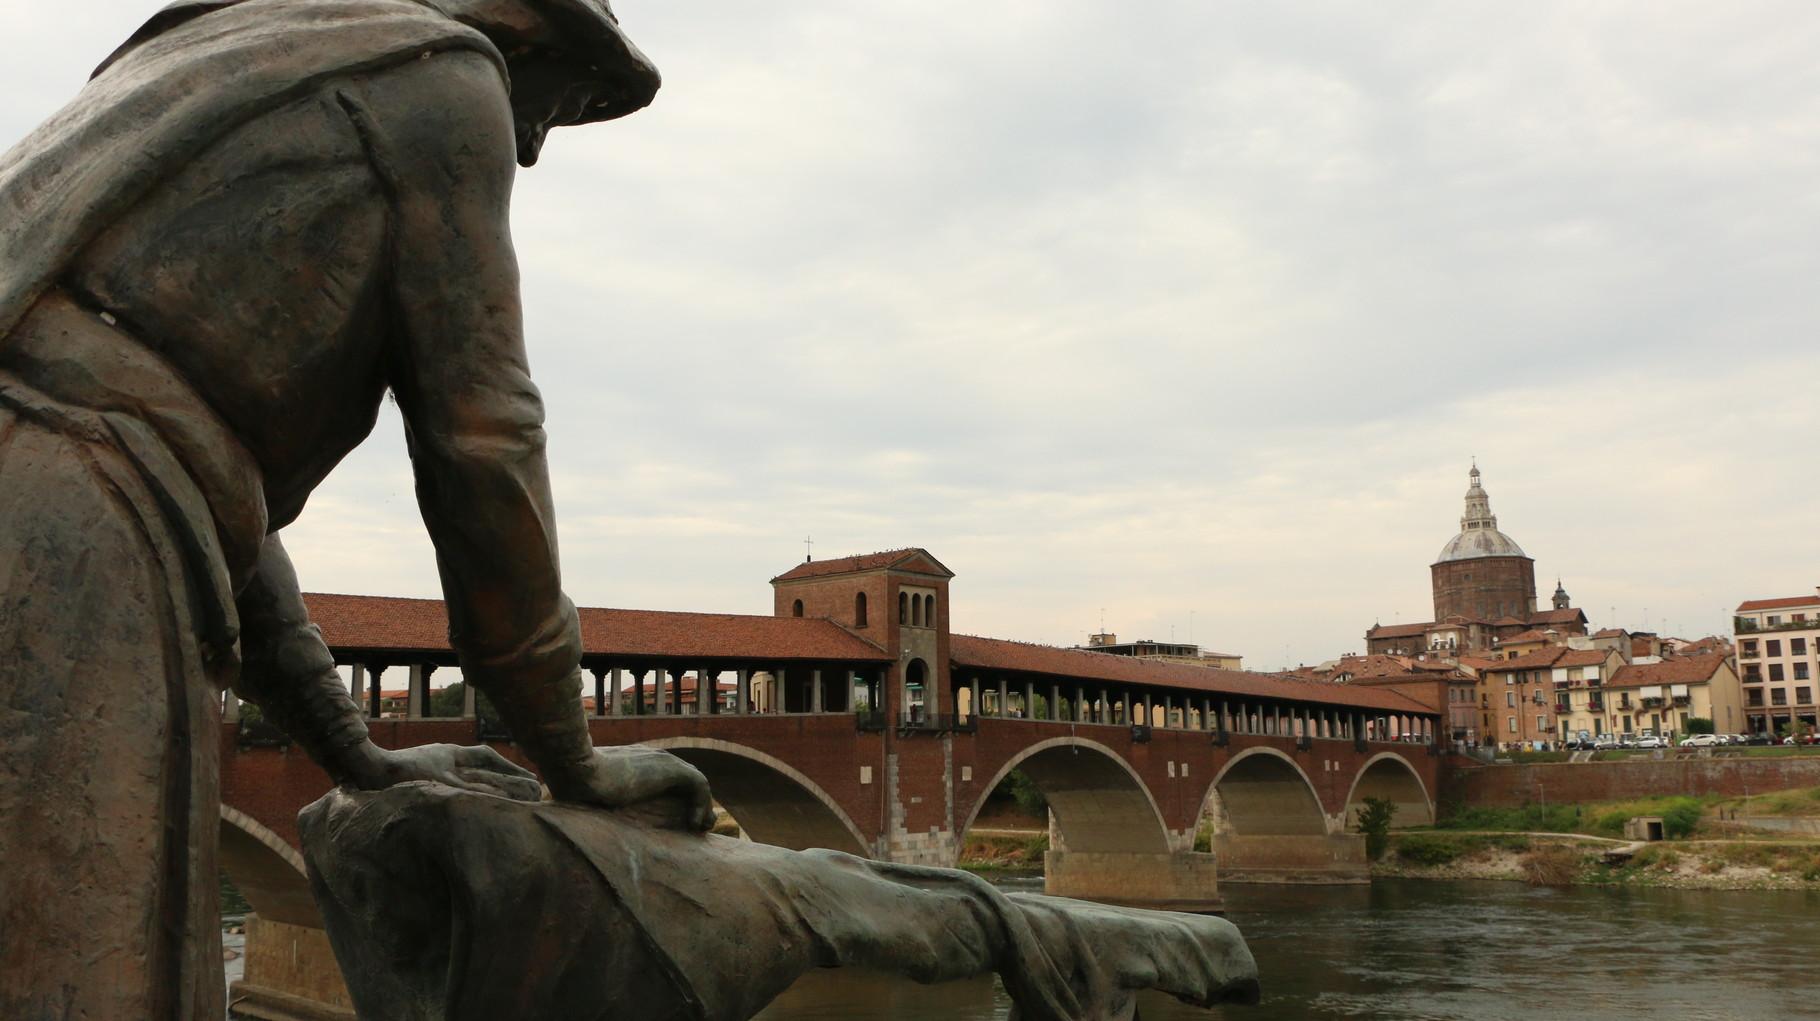 Tappa 13: Garlasco - Pavia | 25,4 km